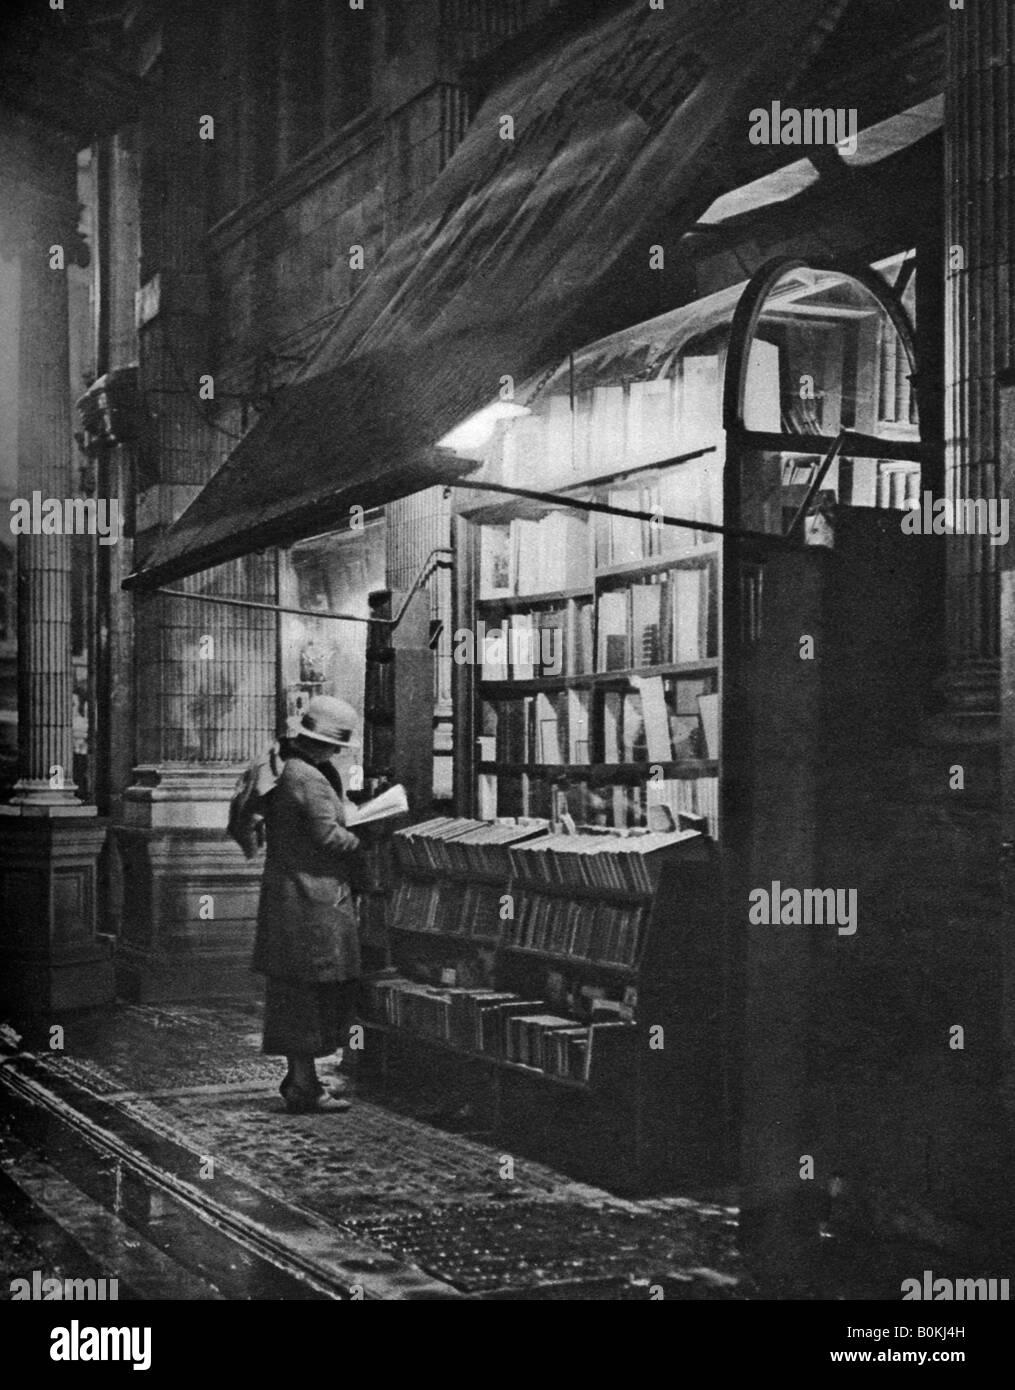 A bookshop in Bloomsbury, London, 1926-1927. Artist: HW Fincham - Stock Image